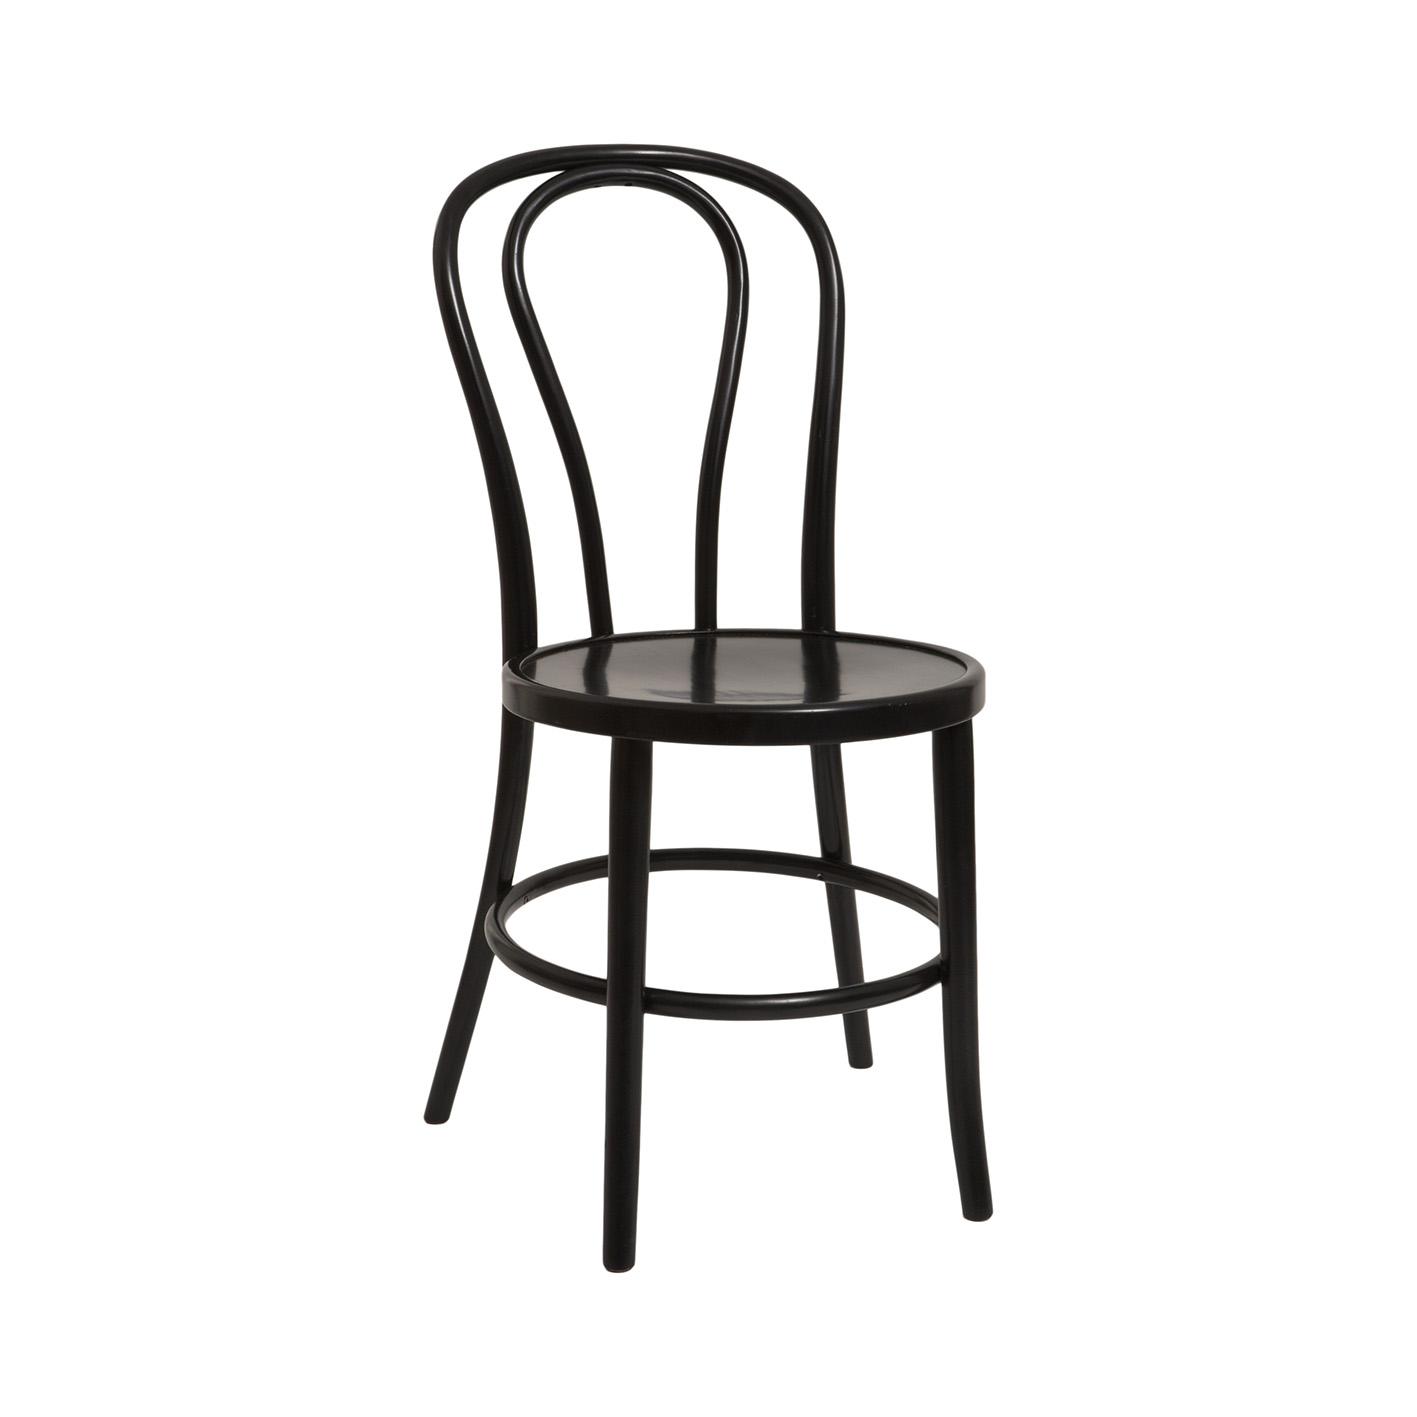 black-bentwood-chair.jpg